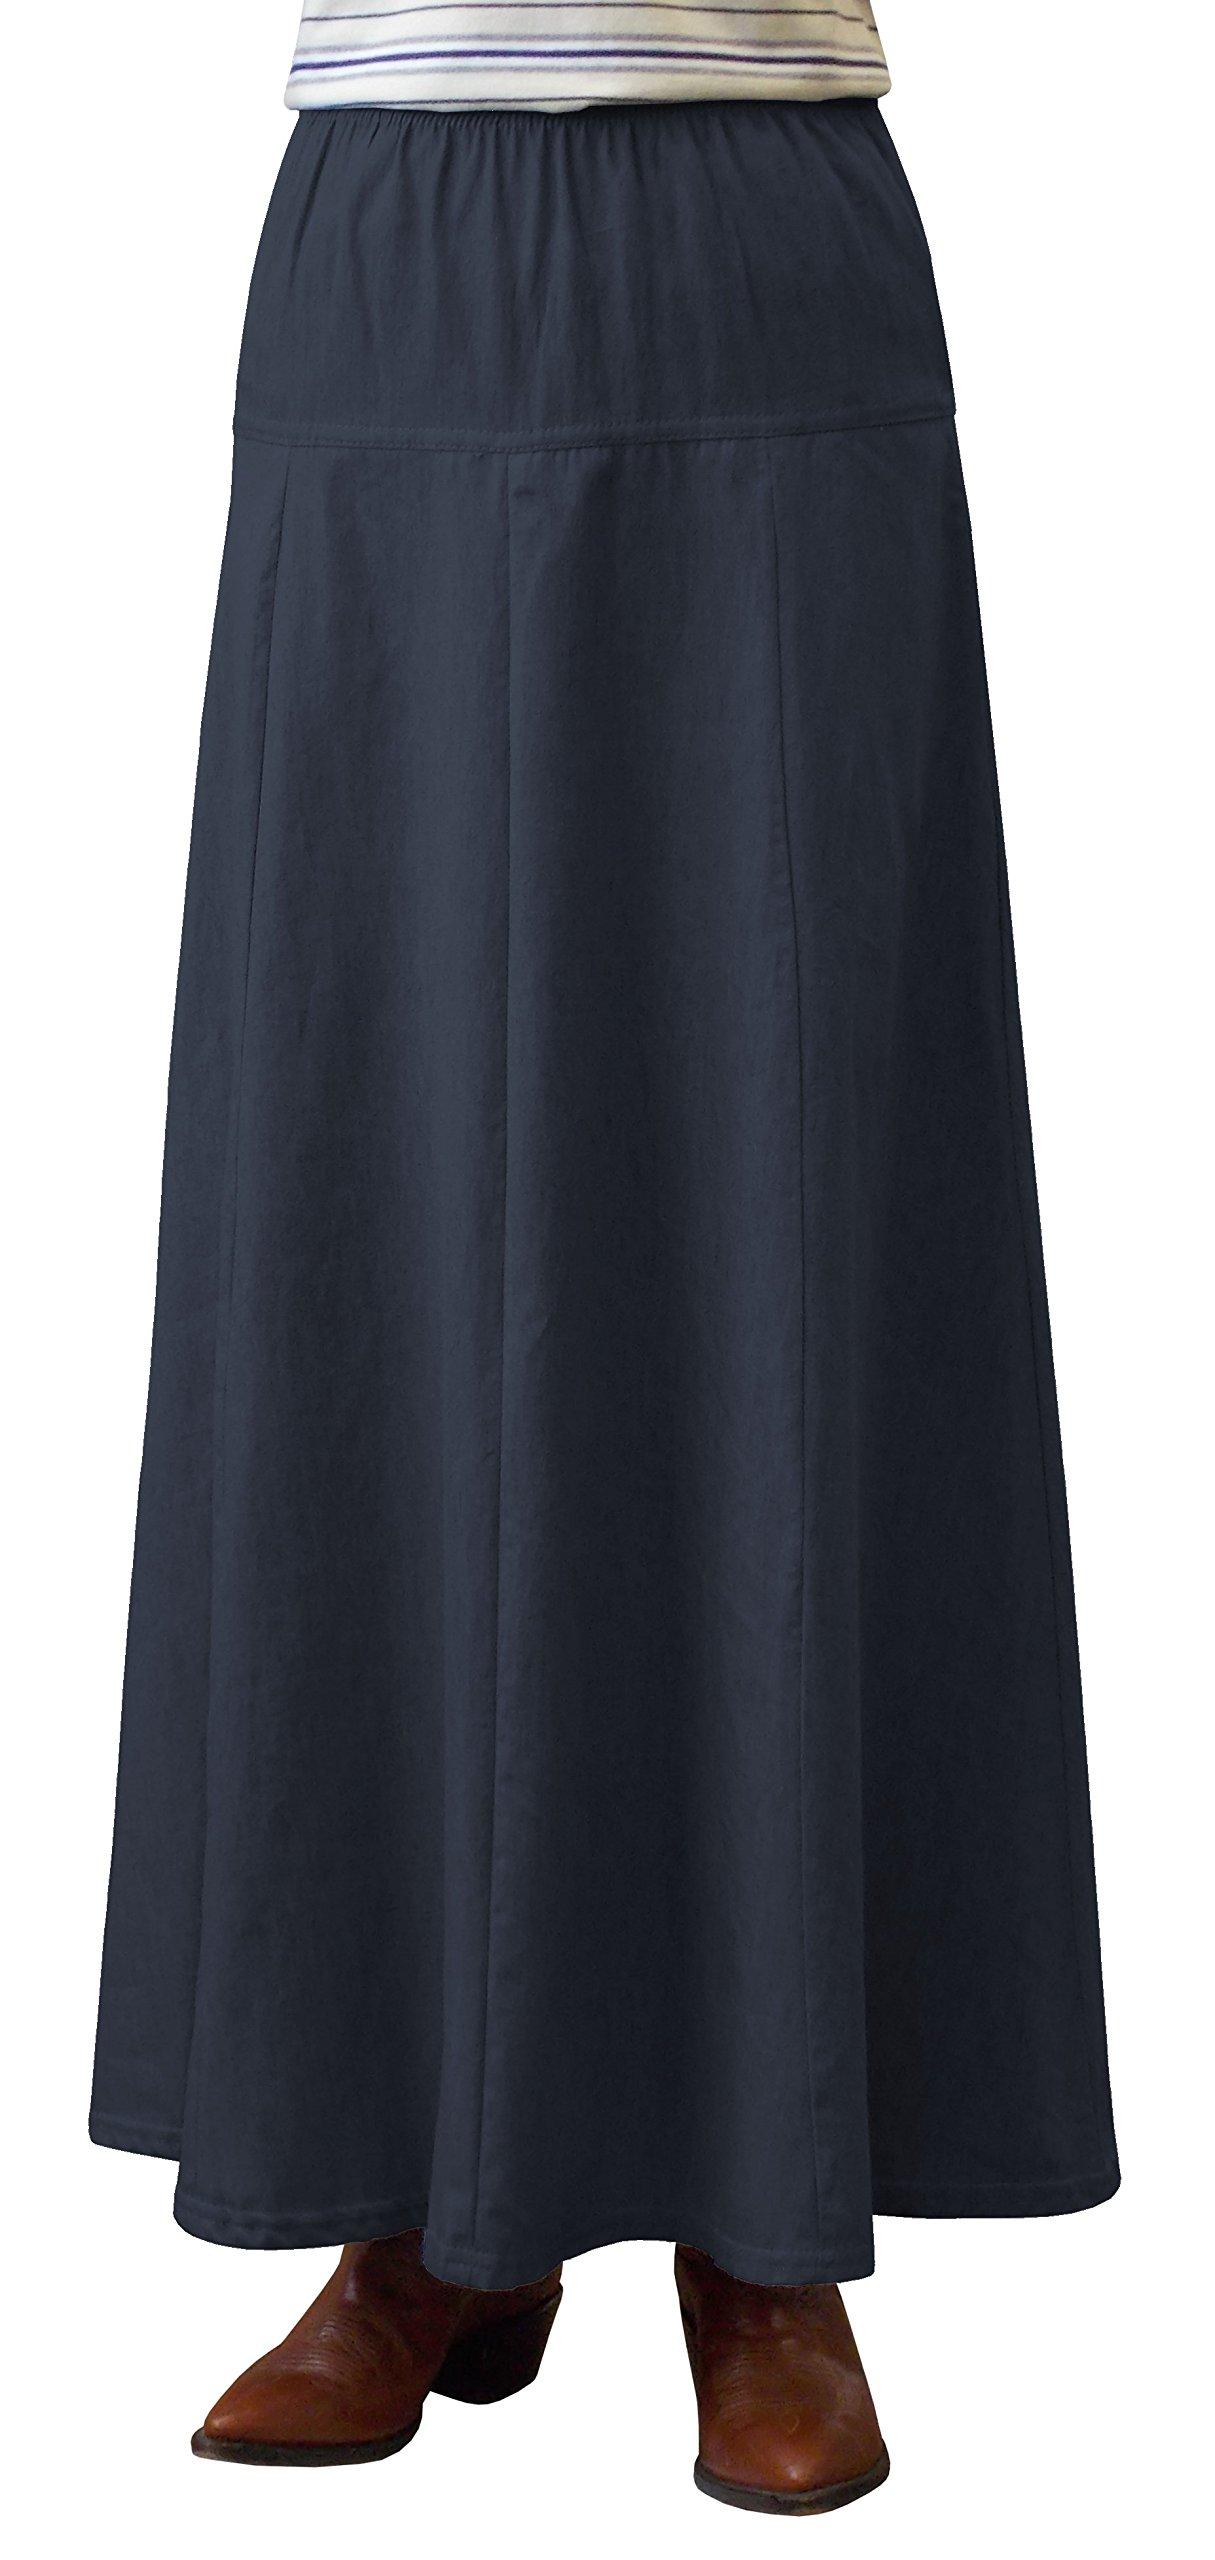 Womens Ultra Soft Lightweight Denim Fit and Flare A-Line Maxi Skirt - Blue Small